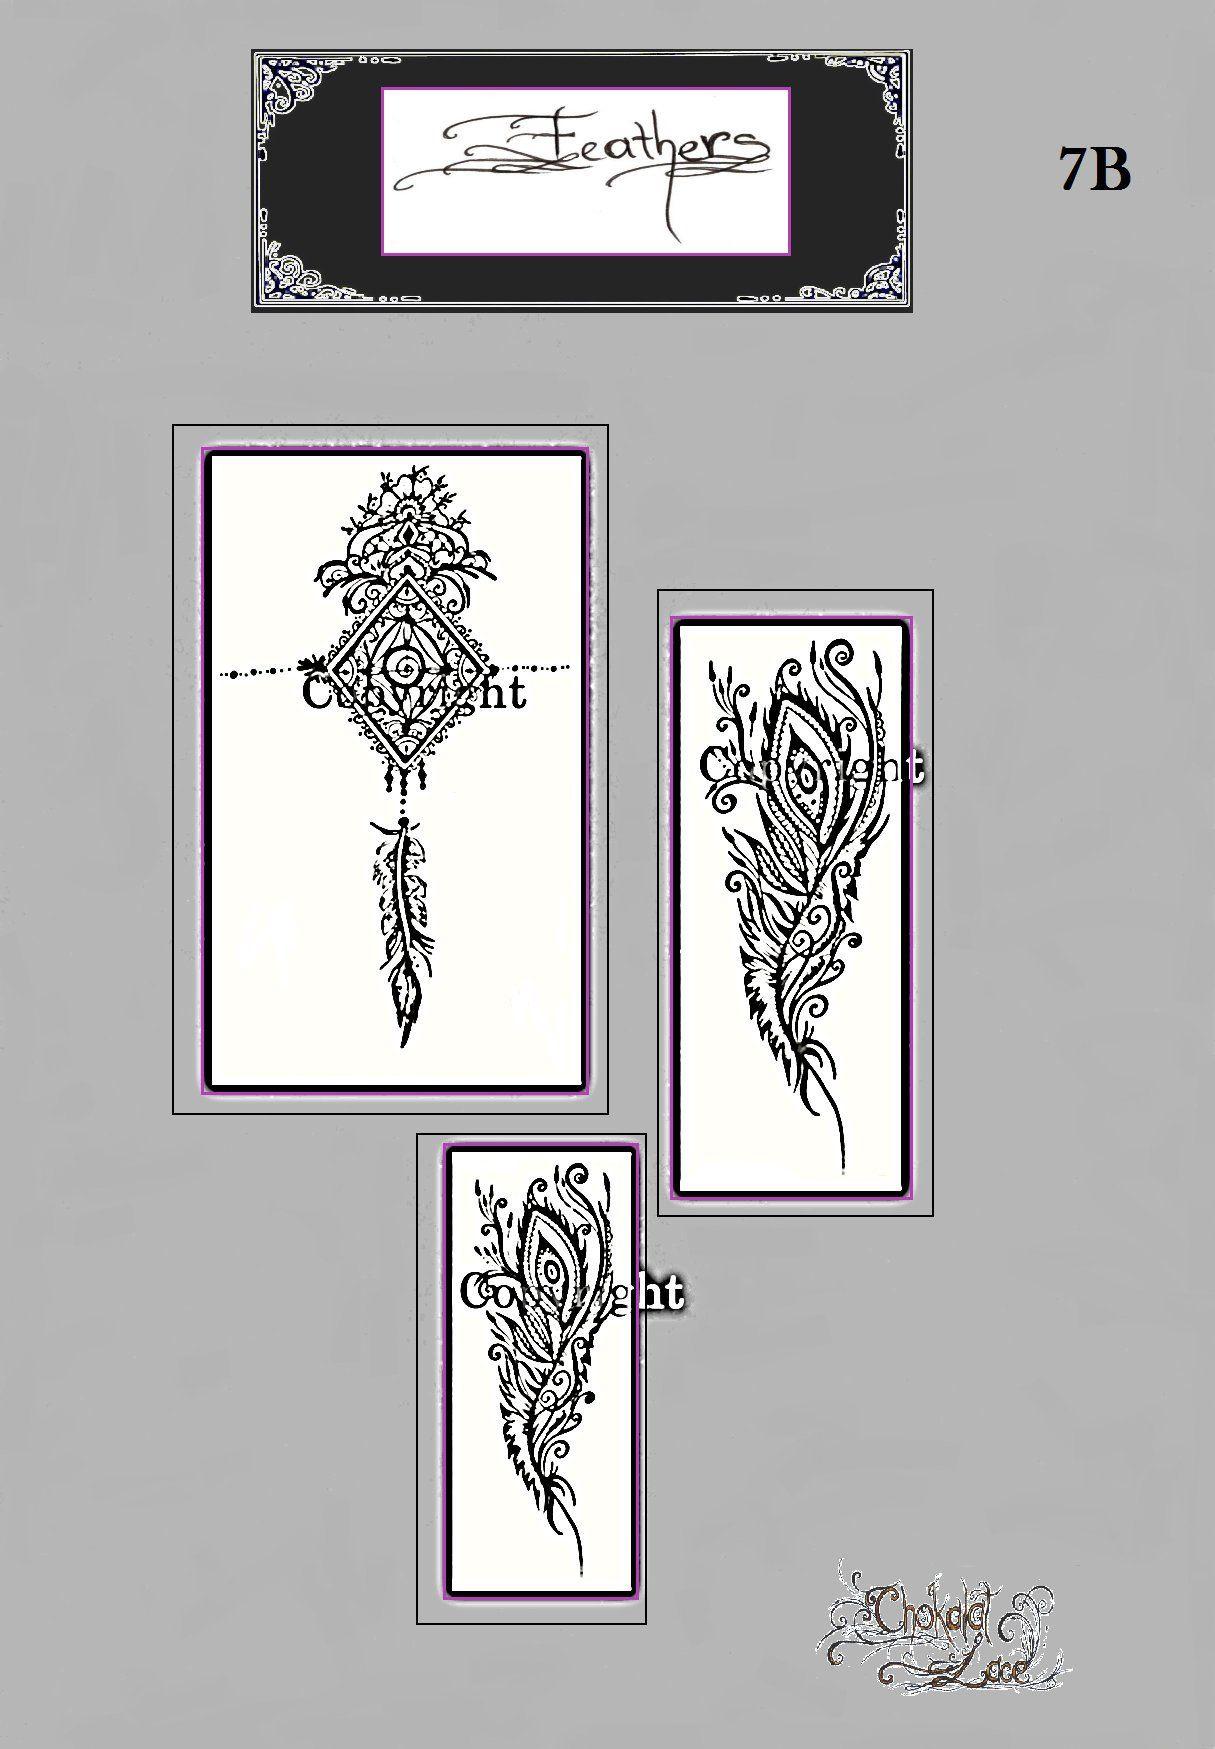 0ad13493836da Feathers, (7B), Henna, Jagua, Tattoo Stencils on Vegan Carbon Thermal  paper(purple) for practice, parties, birthdays, hen's, weddings by  ChokalatLace on ...